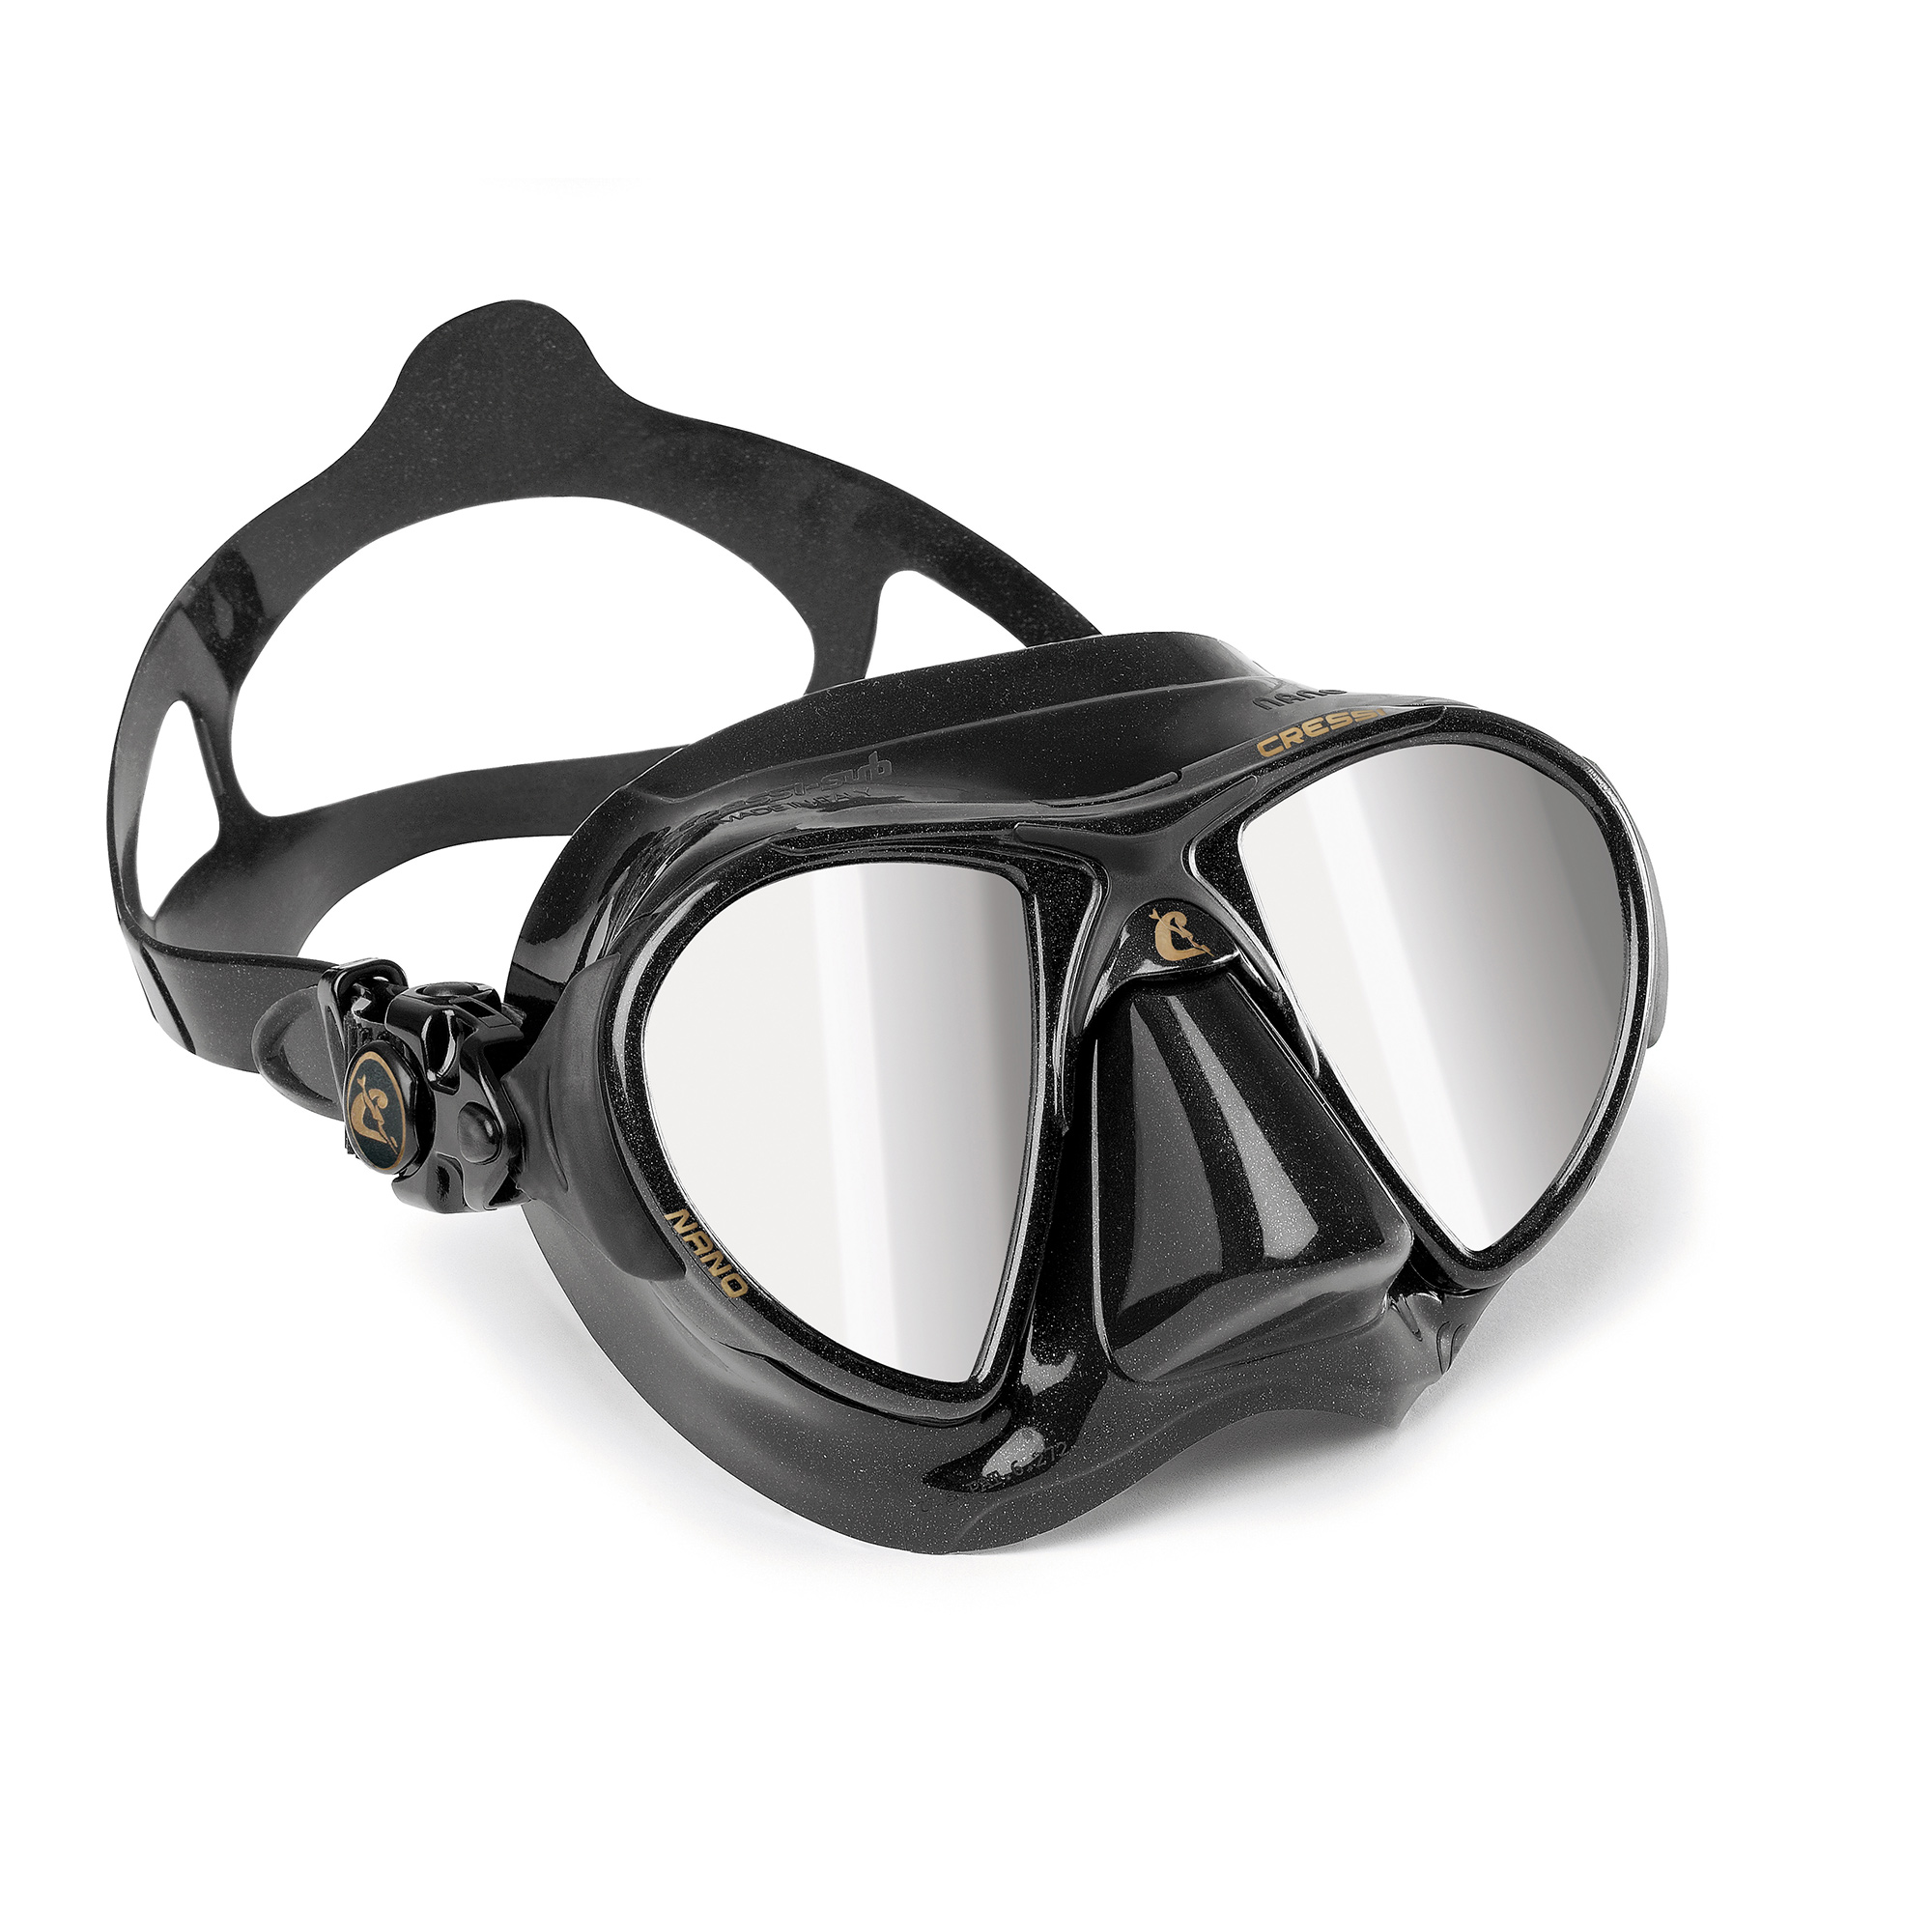 Cressi Nano Black Mask, Two Lens (Mirrored)